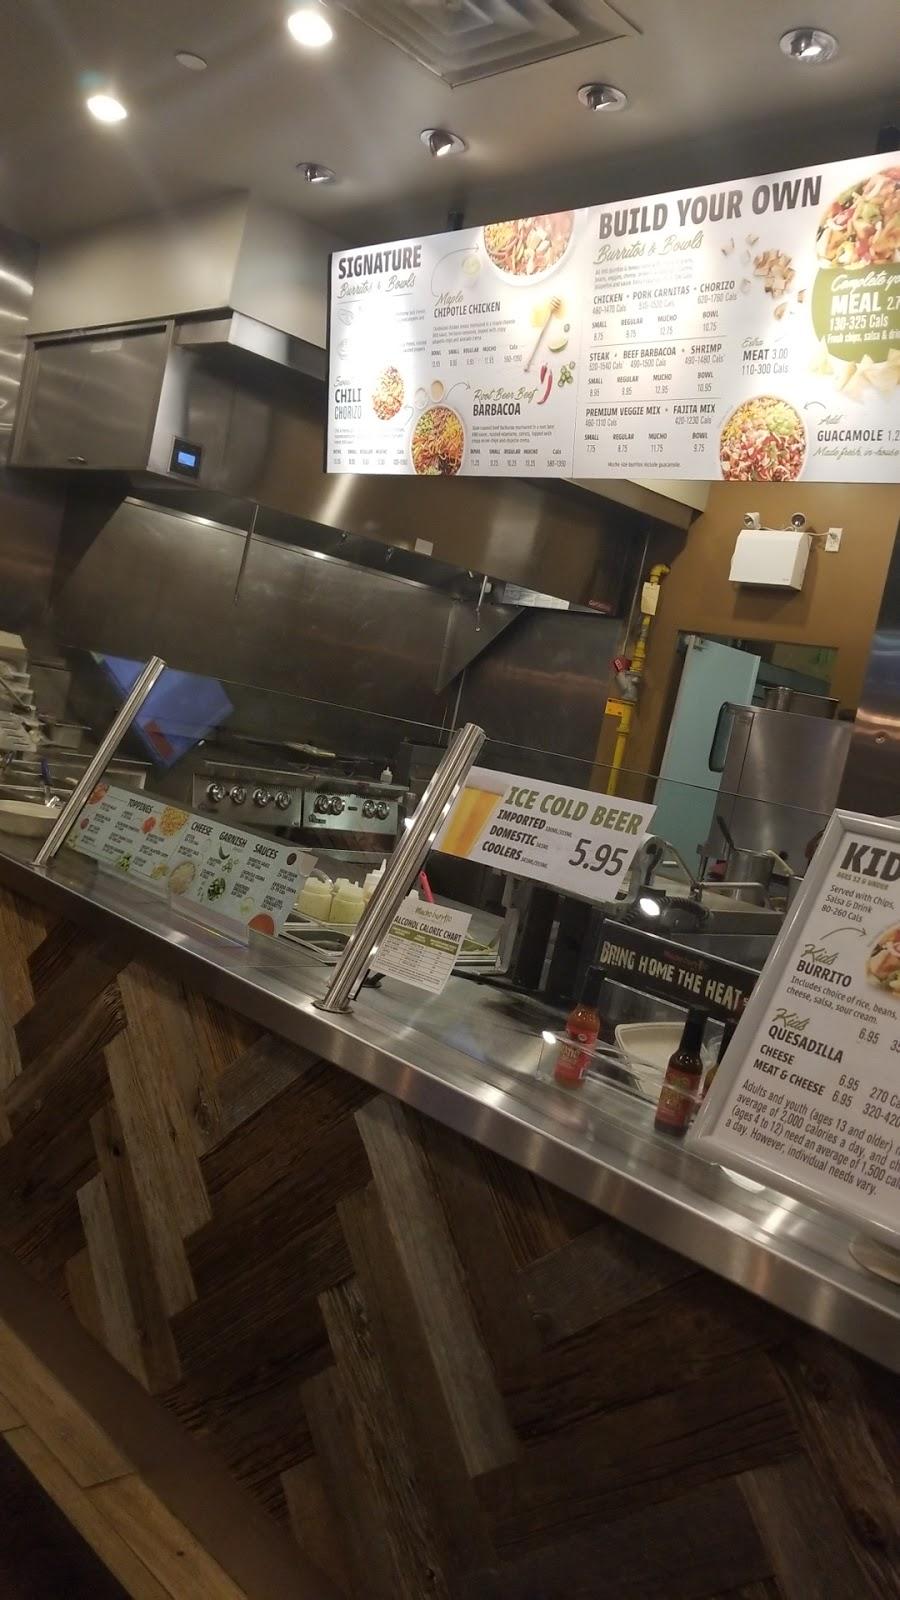 Mucho Burrito Fresh Mexican Grill | restaurant | 770 Gardiners Rd A006, Kingston, ON K7M 3X9, Canada | 6133896666 OR +1 613-389-6666